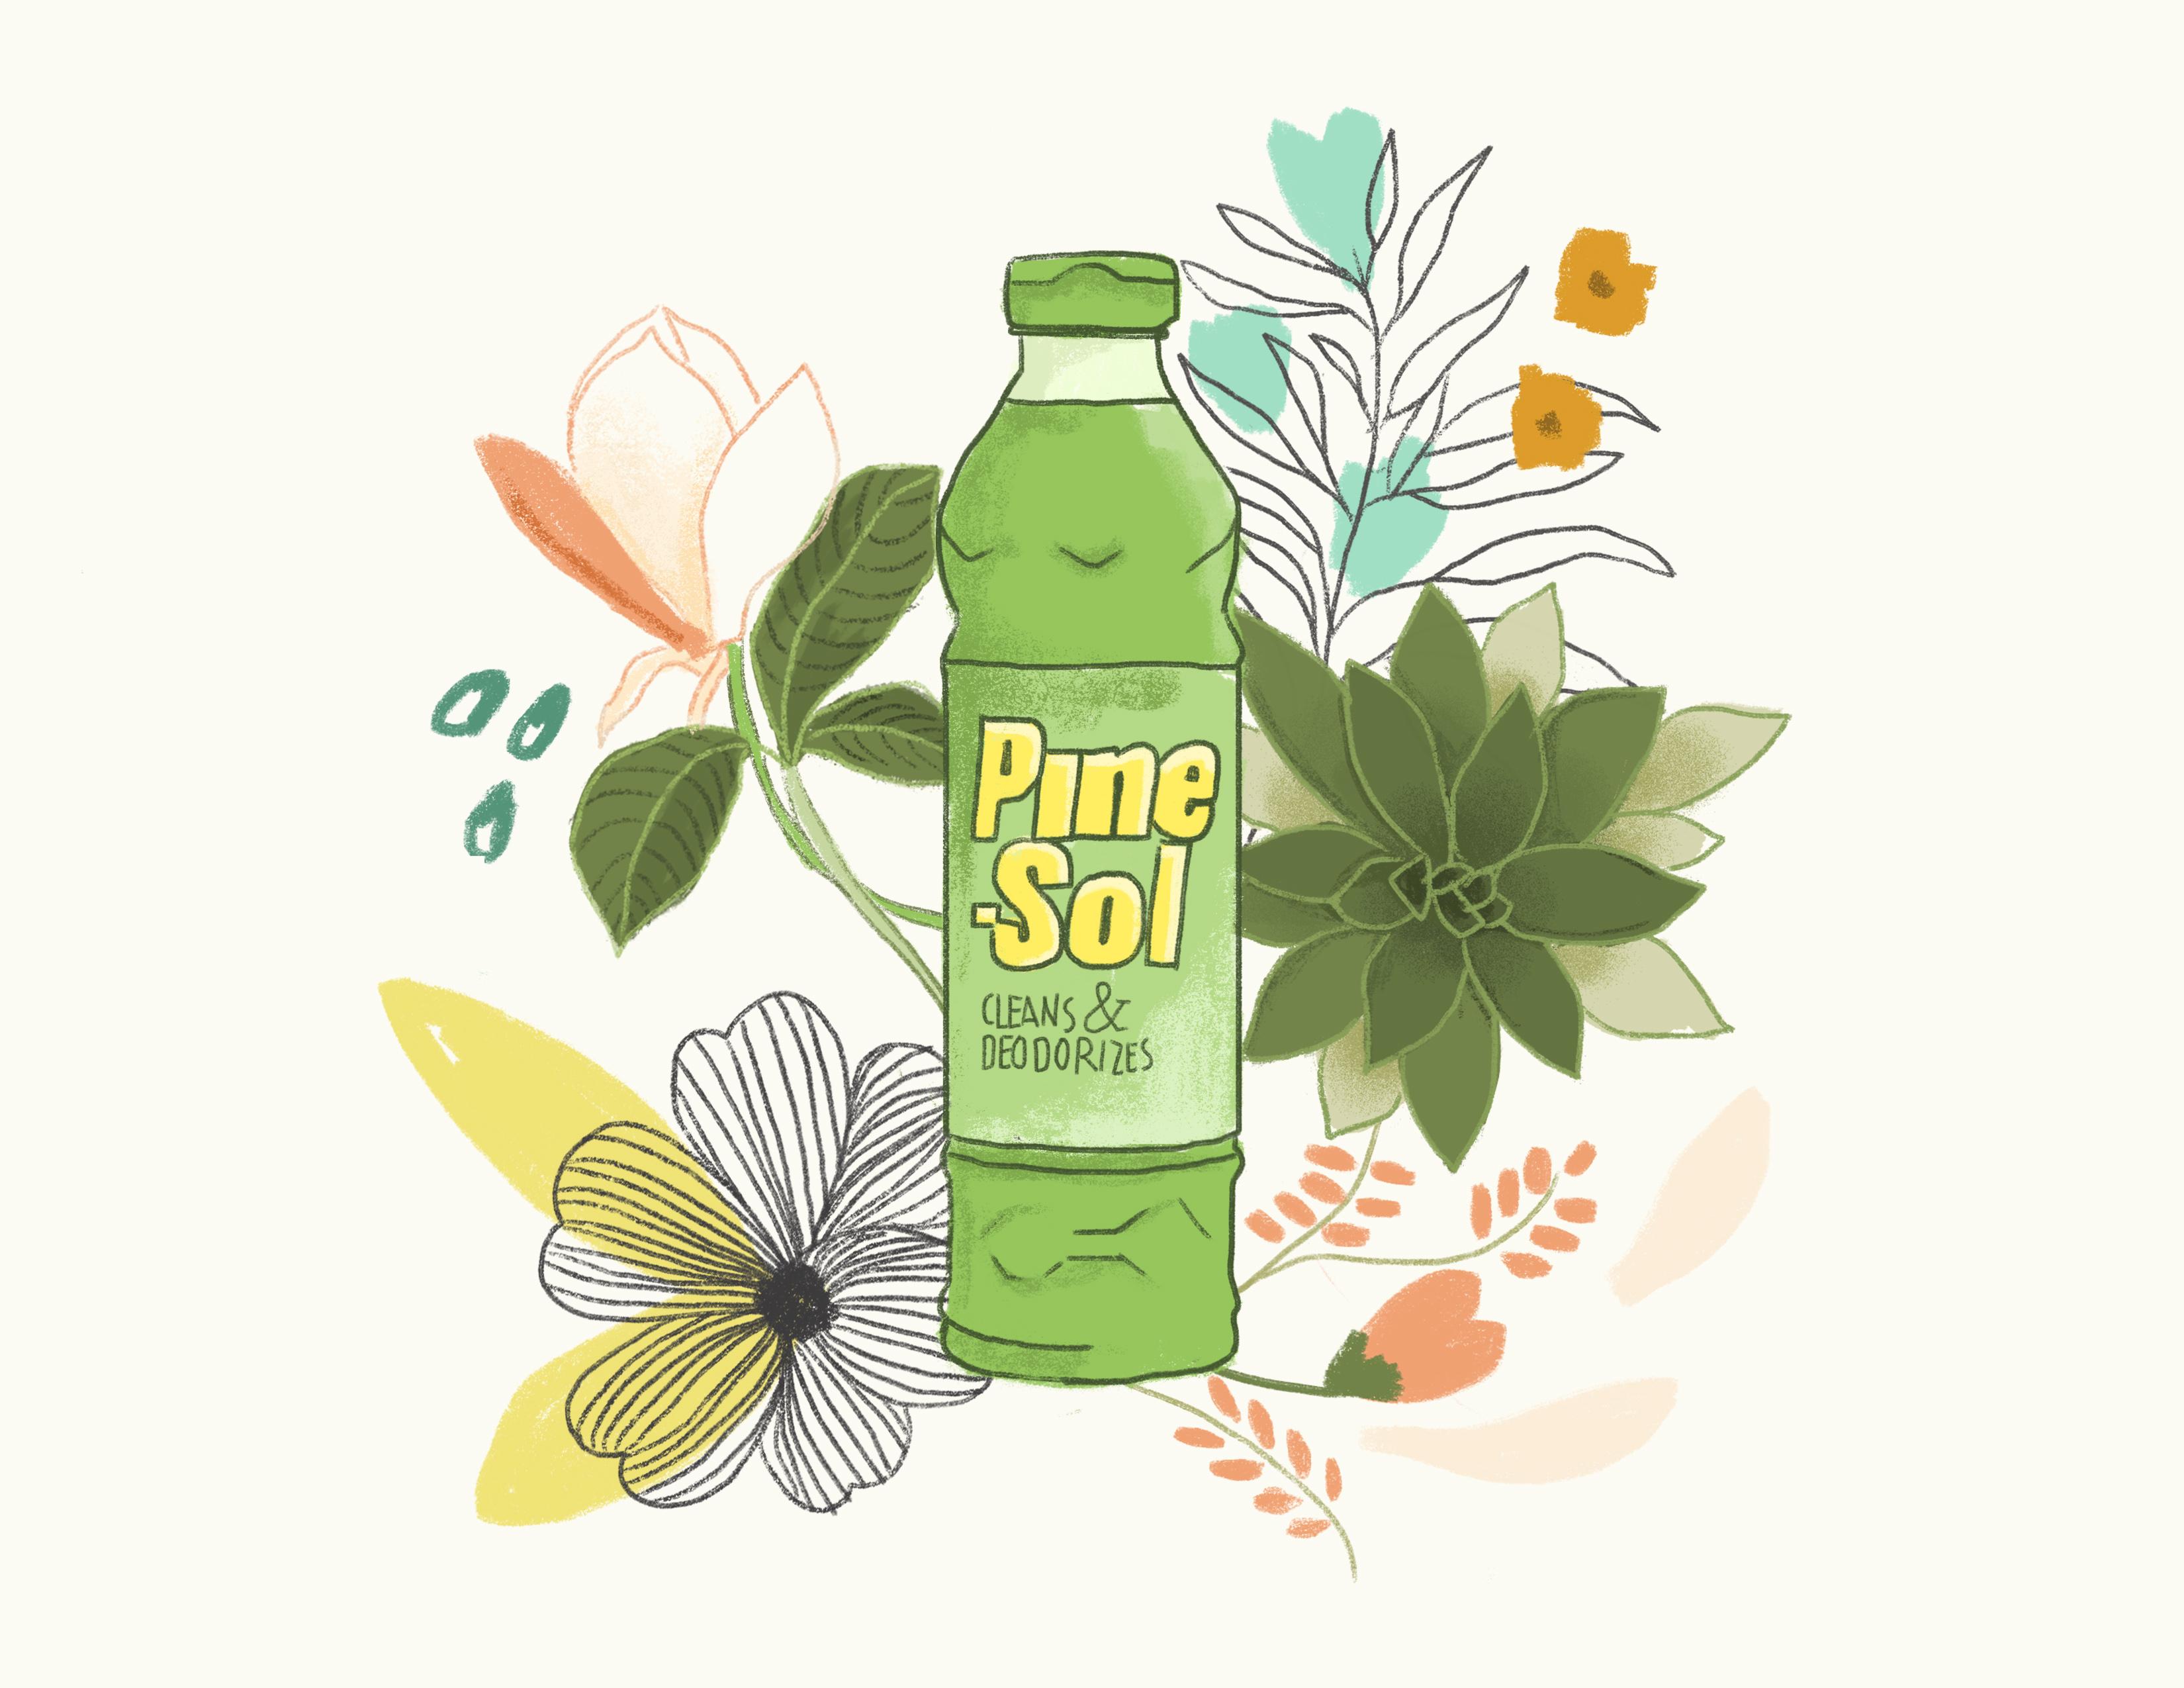 nolisoli sponsored pine-sol